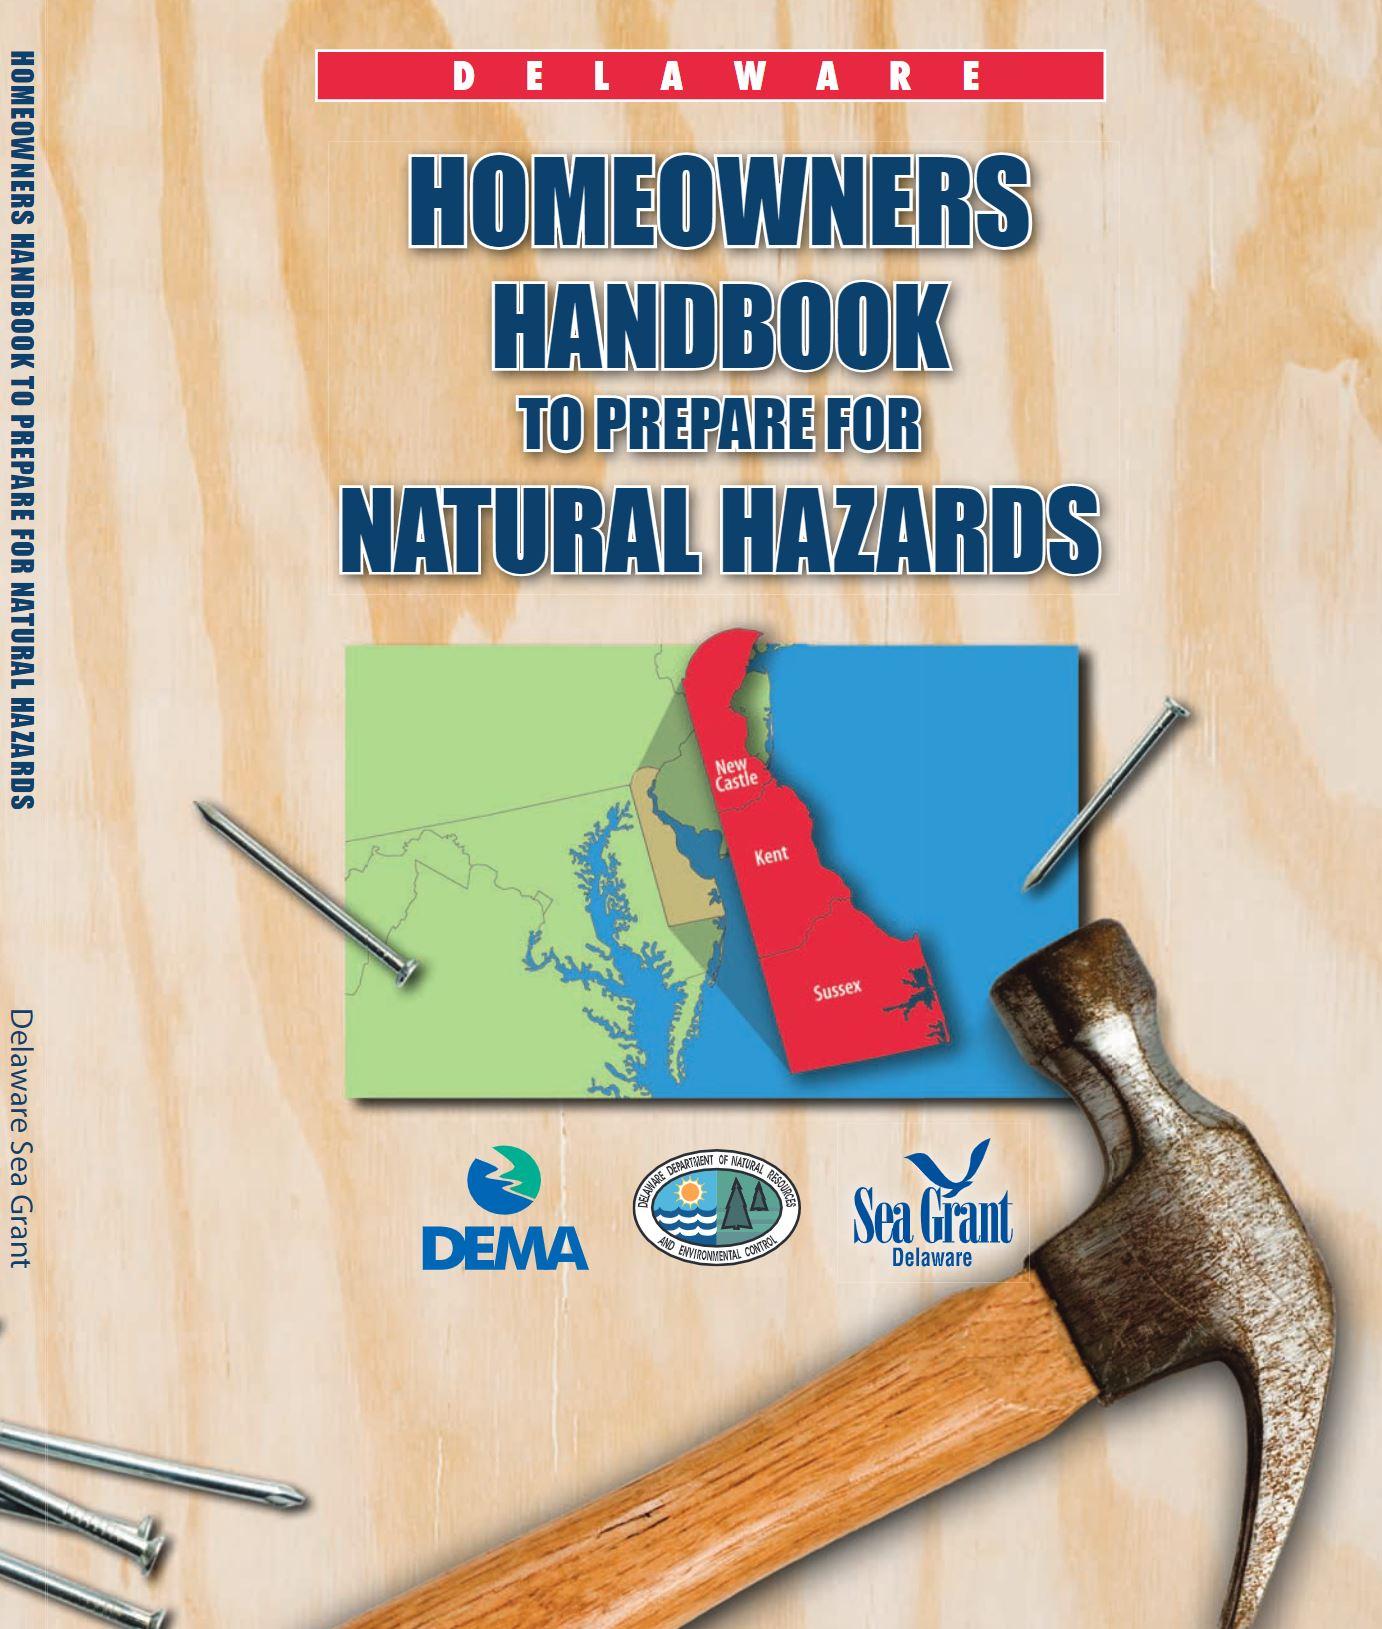 Delaware Homeowners Handbook